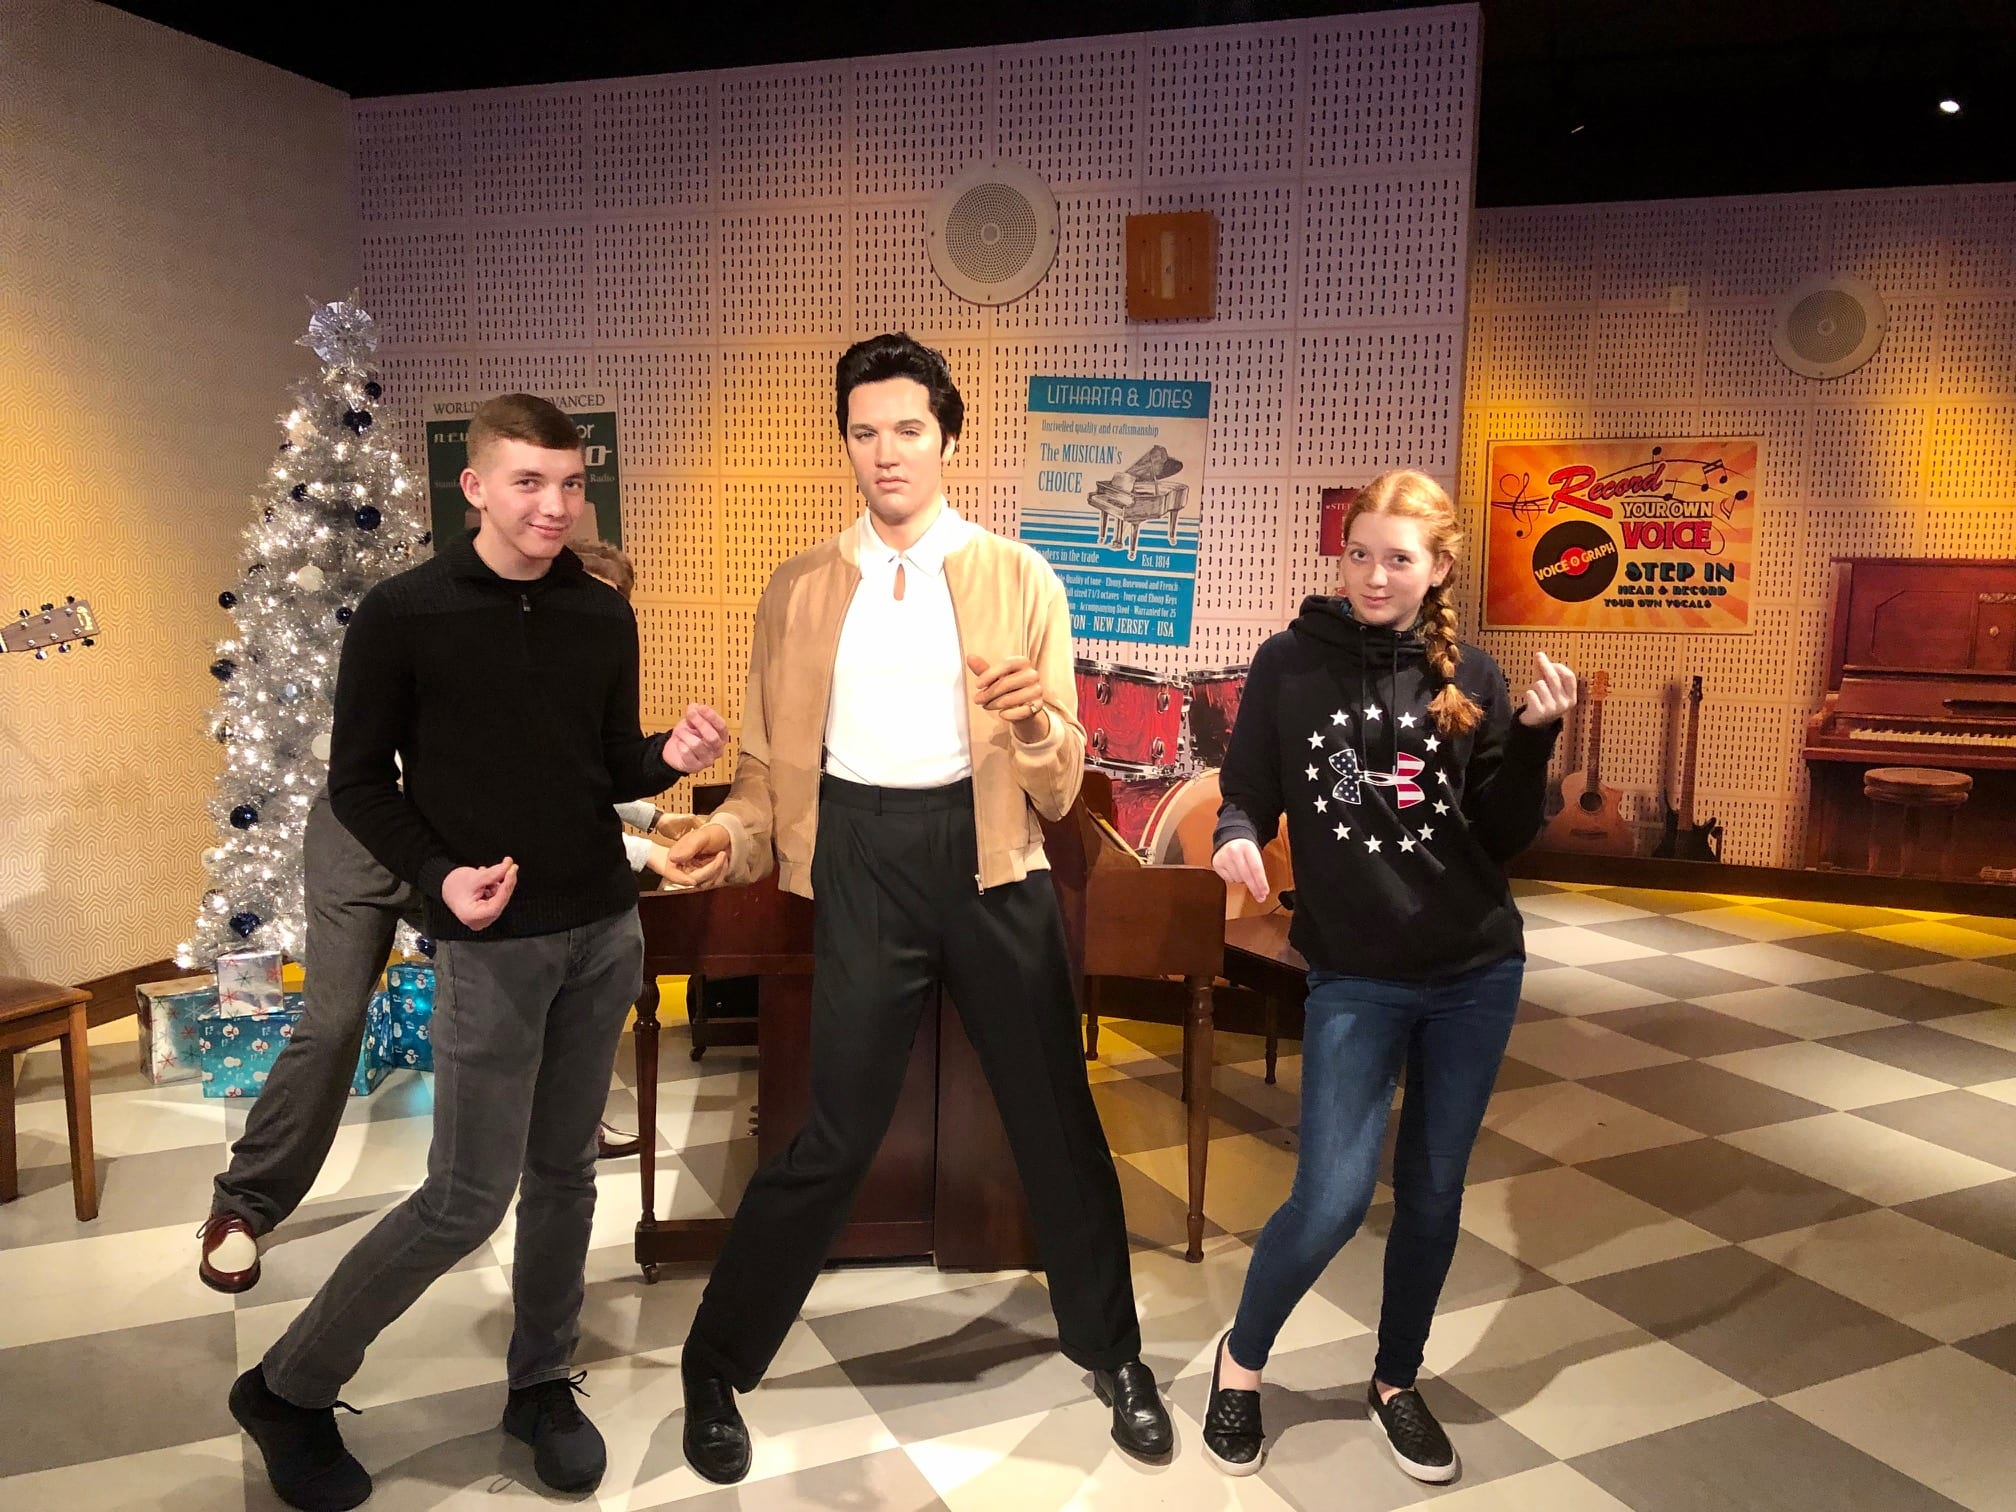 Madame Tussauds Wax Museum Nashville Tennessee